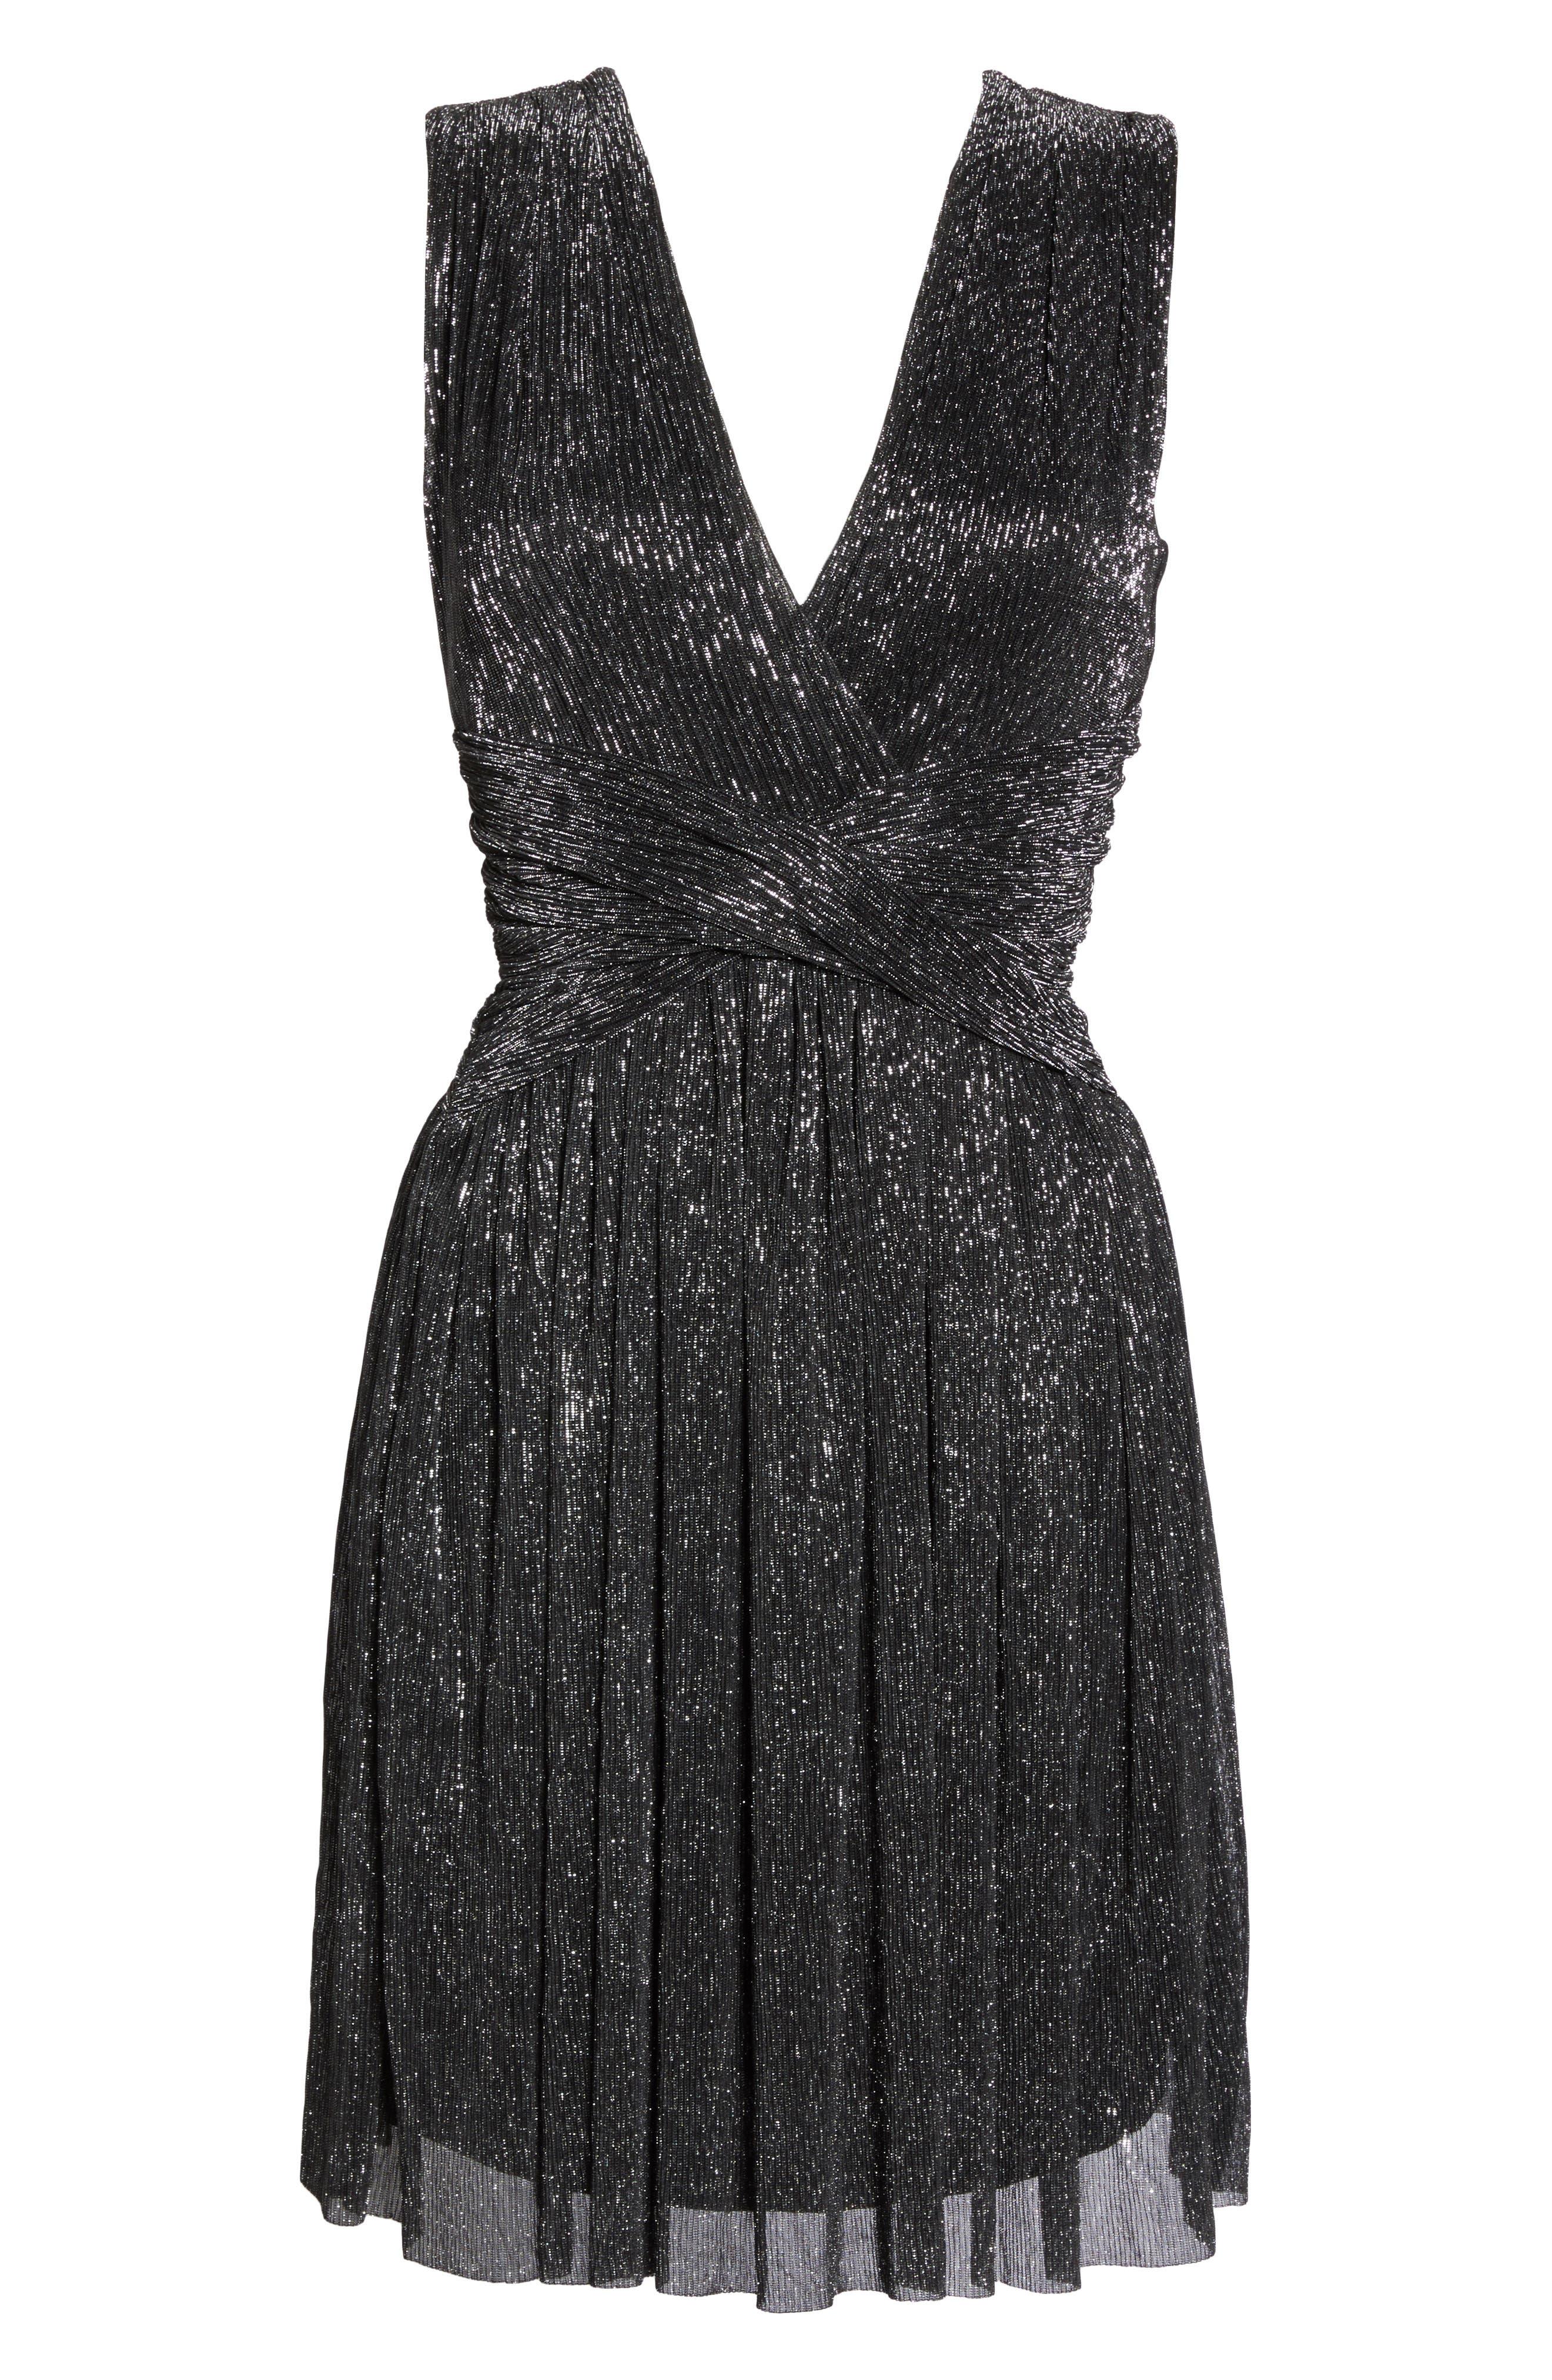 Marcelle Fit & Flare Dress,                             Alternate thumbnail 6, color,                             001